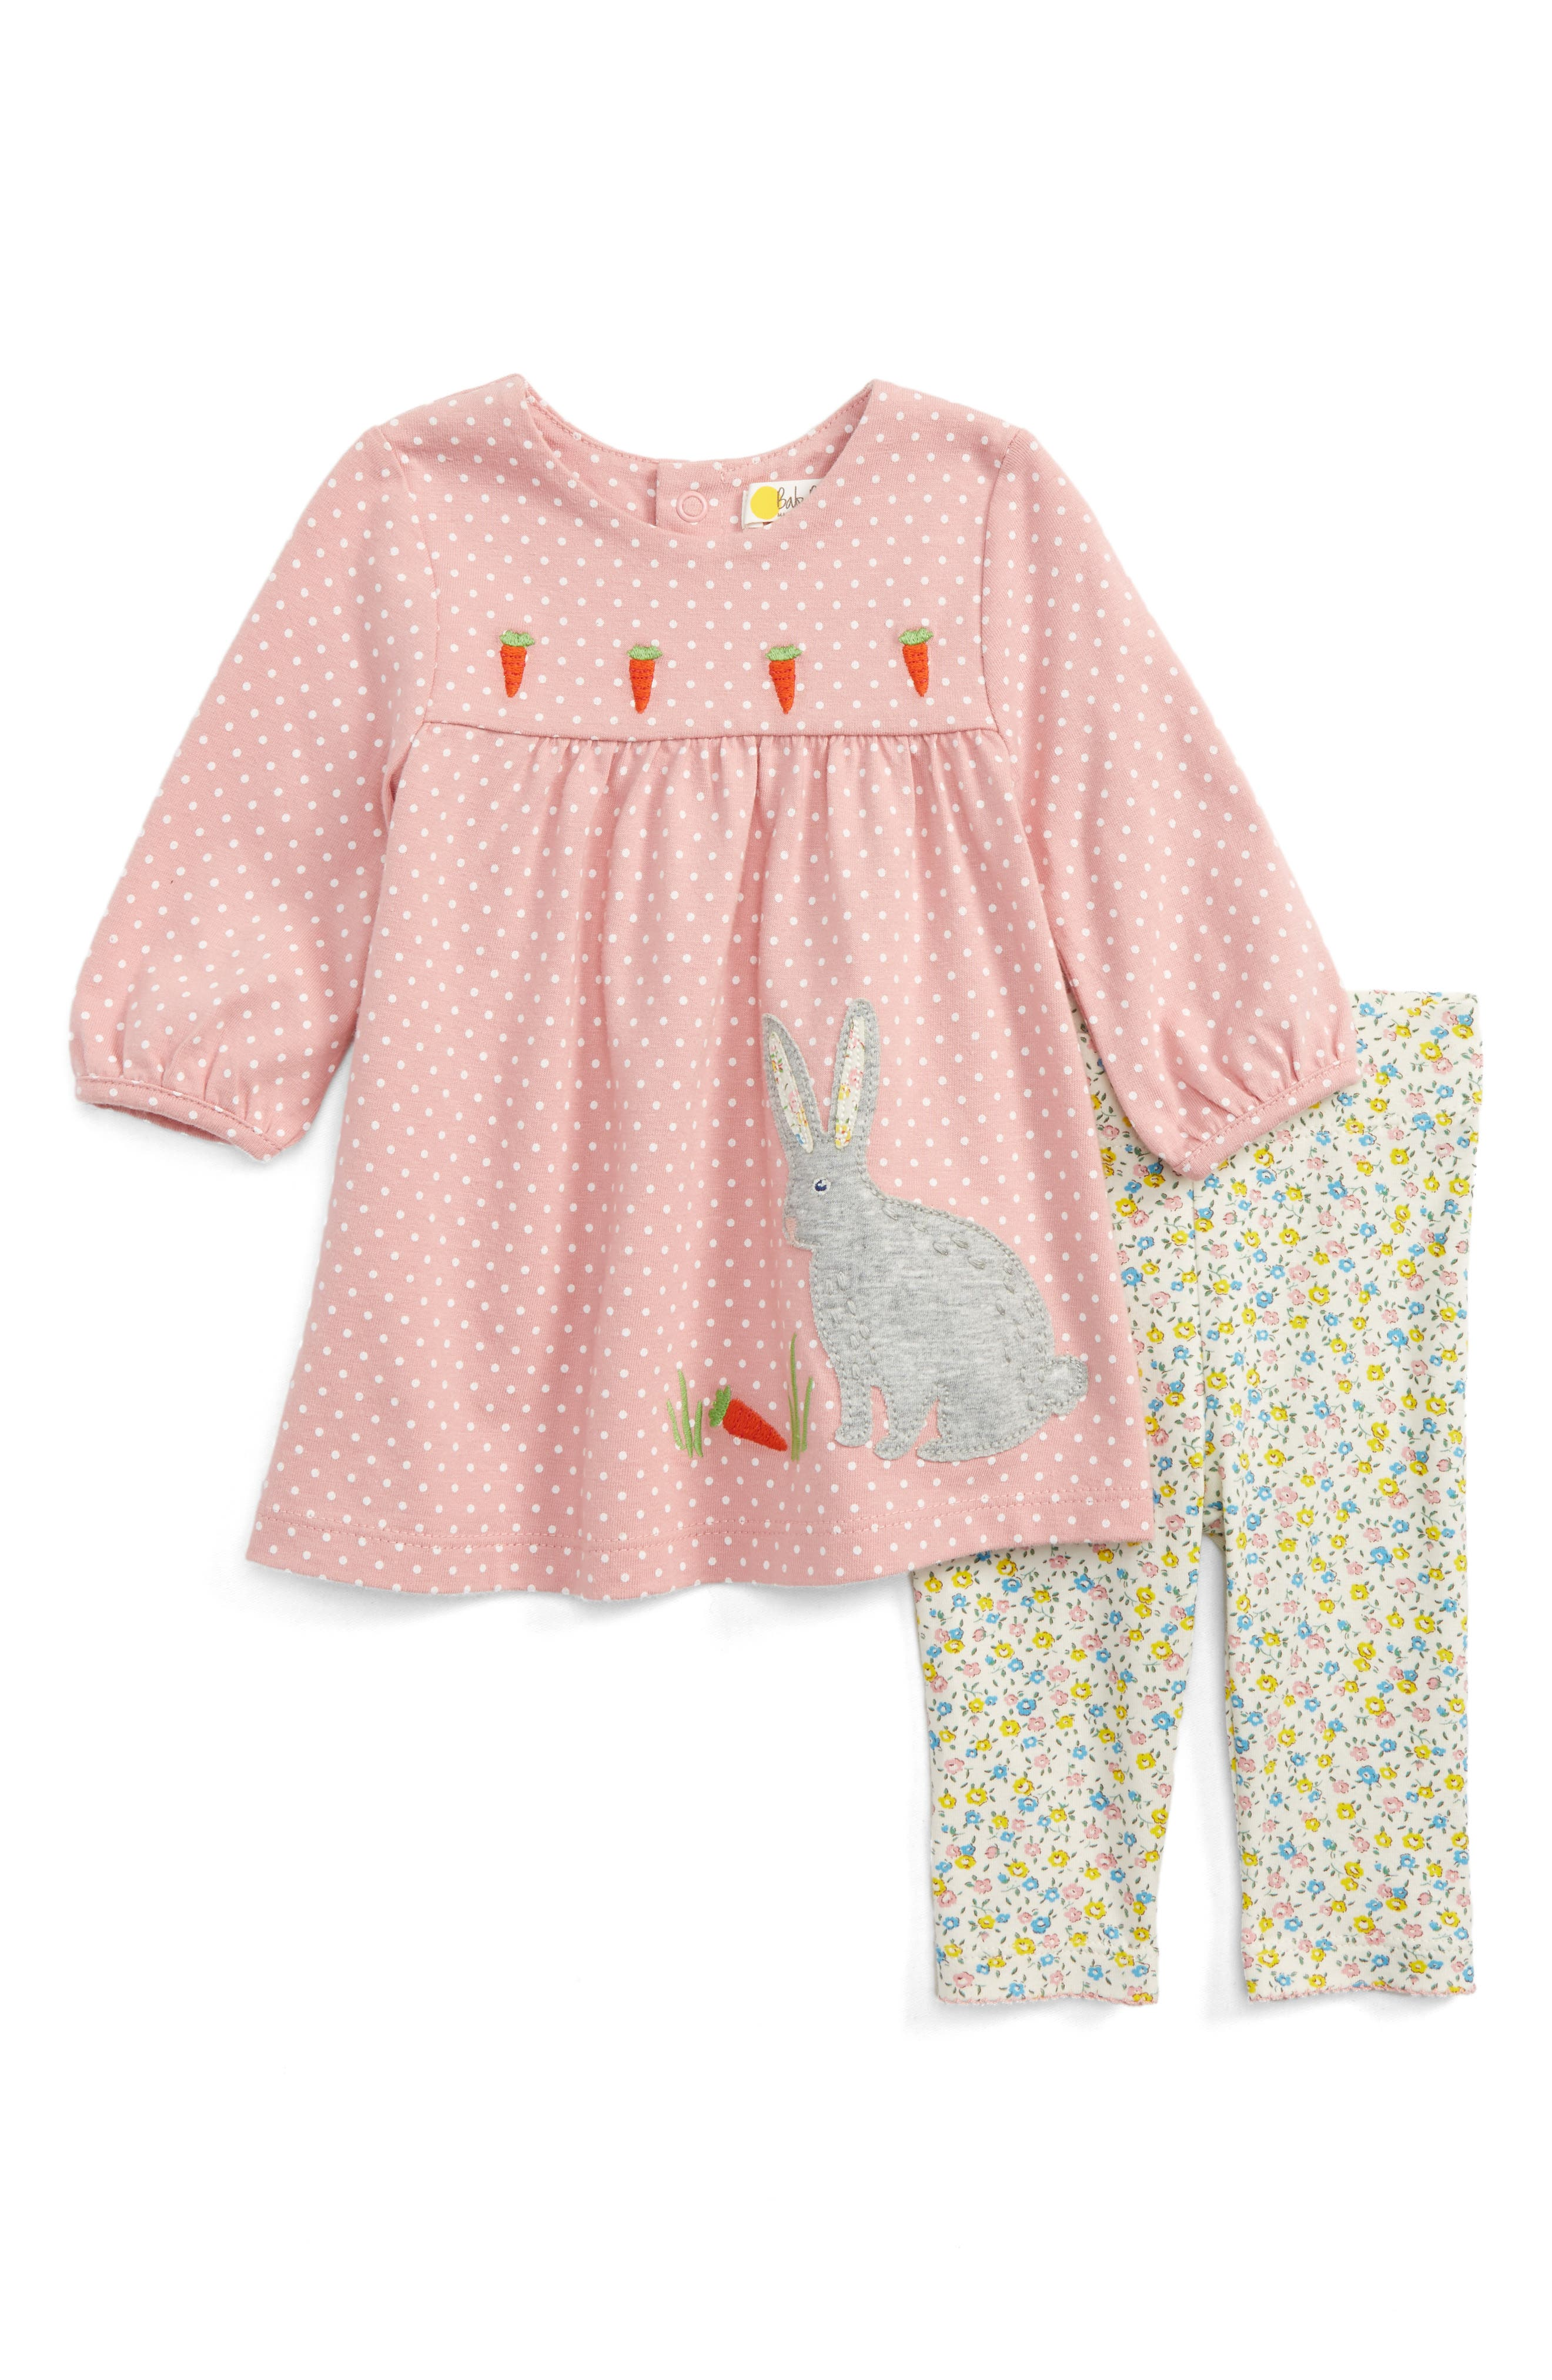 Appliqué Dress & Leggings Set,                         Main,                         color, Almond Blossom Pink Pin Spot